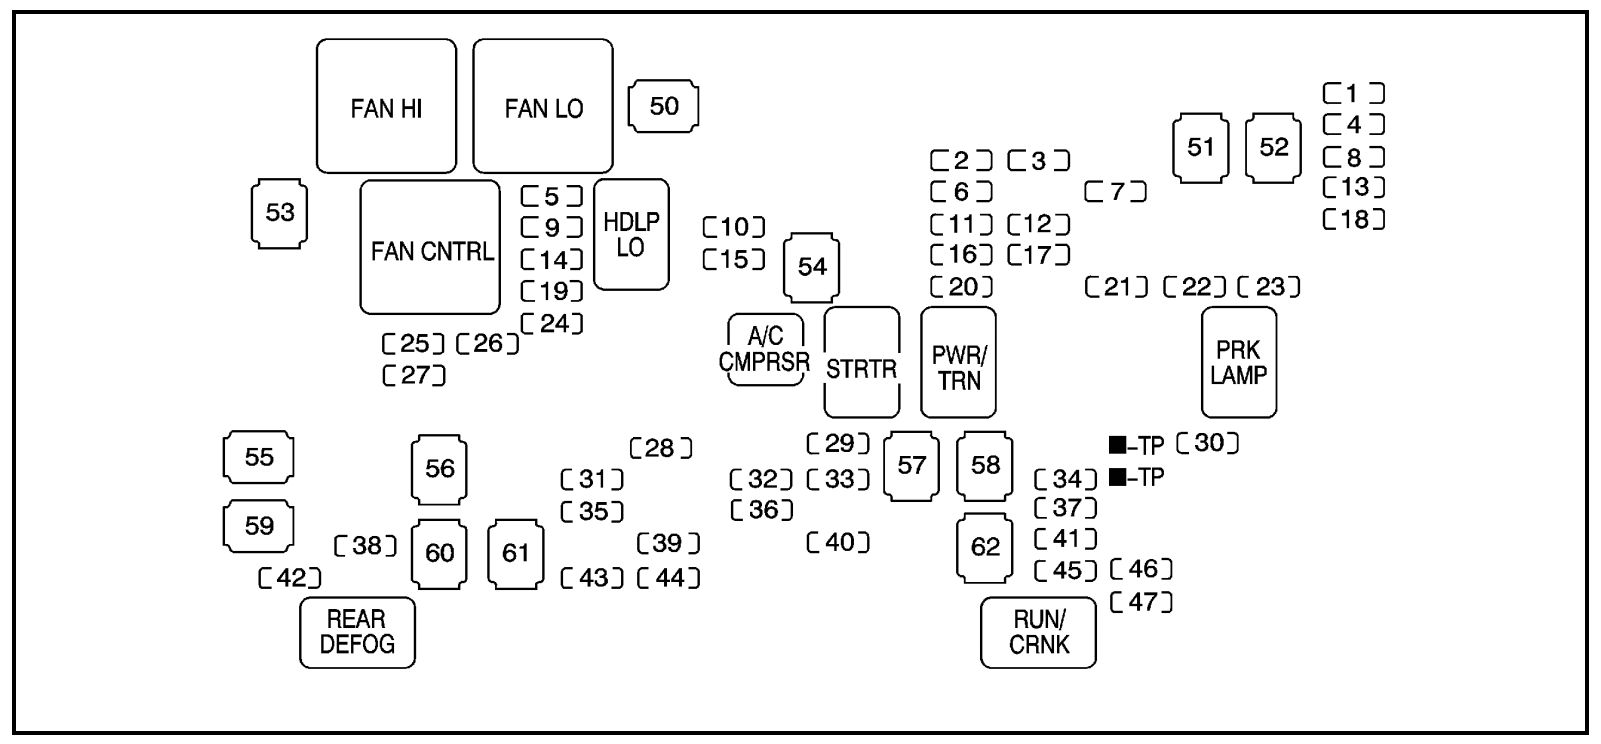 h1 fuse diagram hyundai h100 fuse box diagram wiring library 06 F150 Fuse Box Diagram 08 hummer h2 fuse box wiring diagrams electric fuse box wiring h1 fuse box diagram